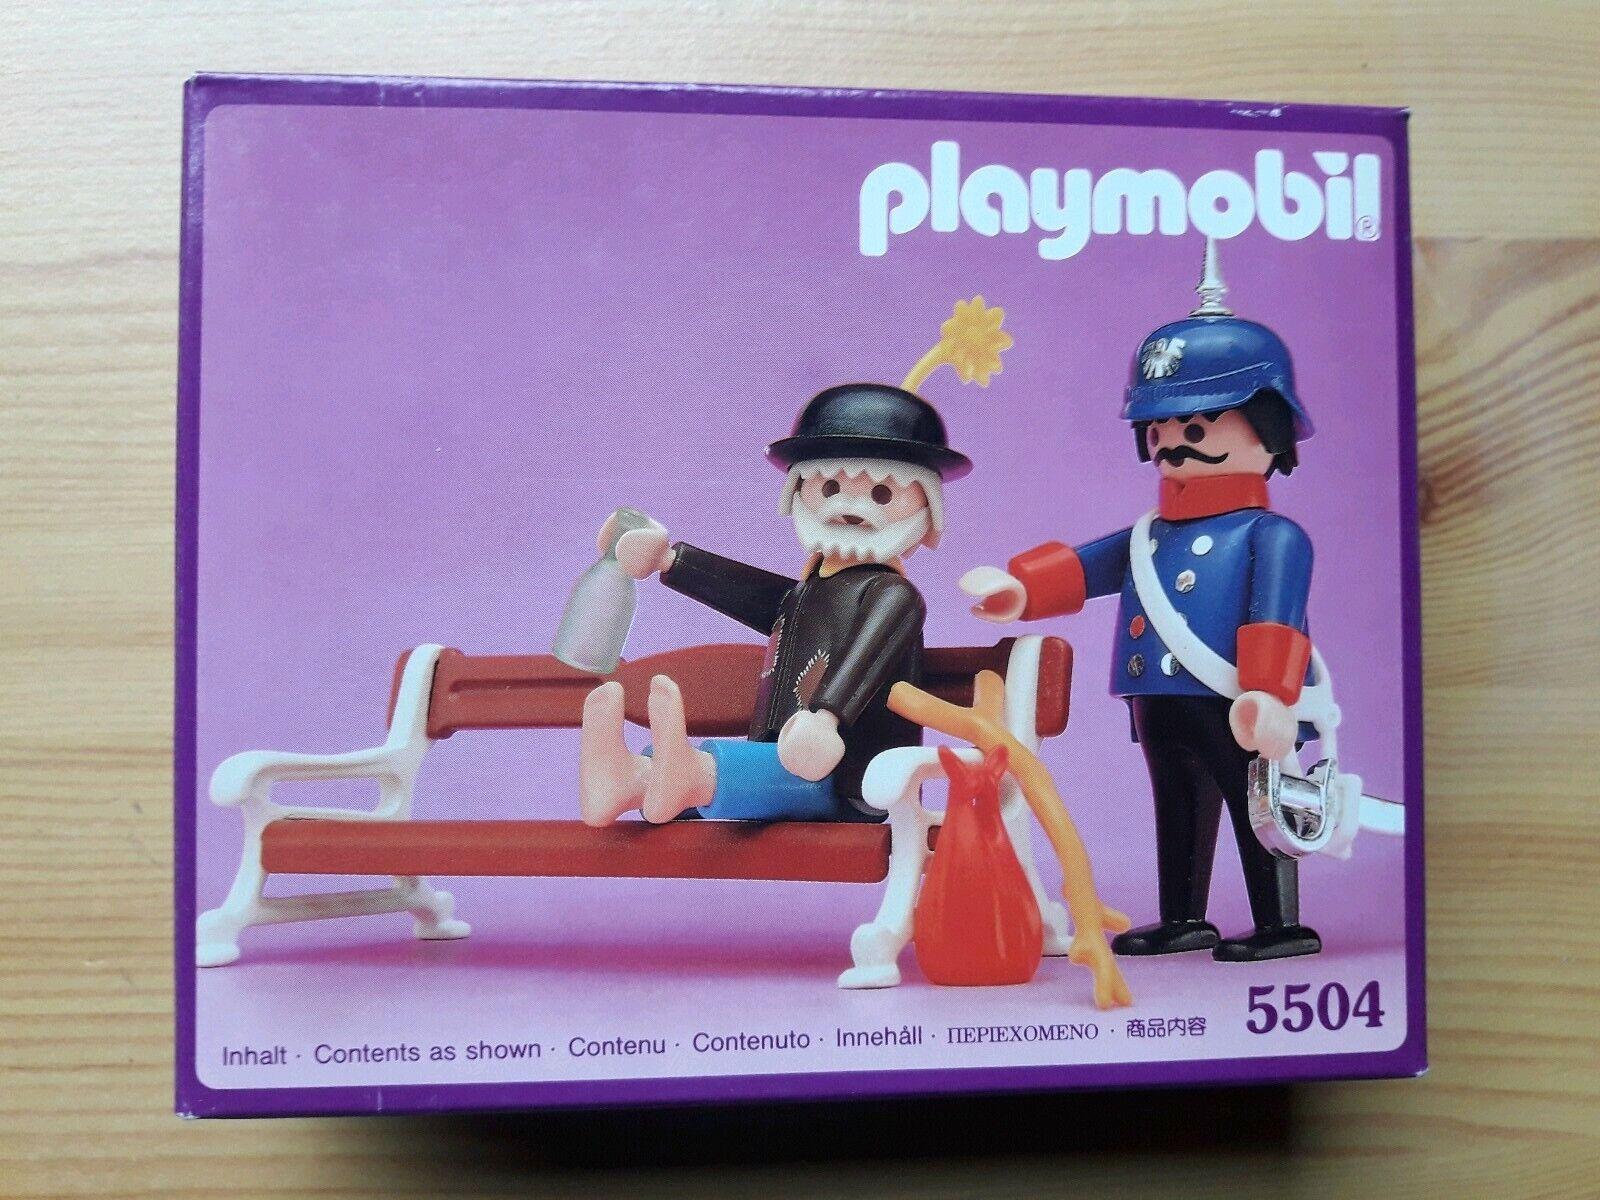 Le Gendarme belle epoque Neuf Playnobil R